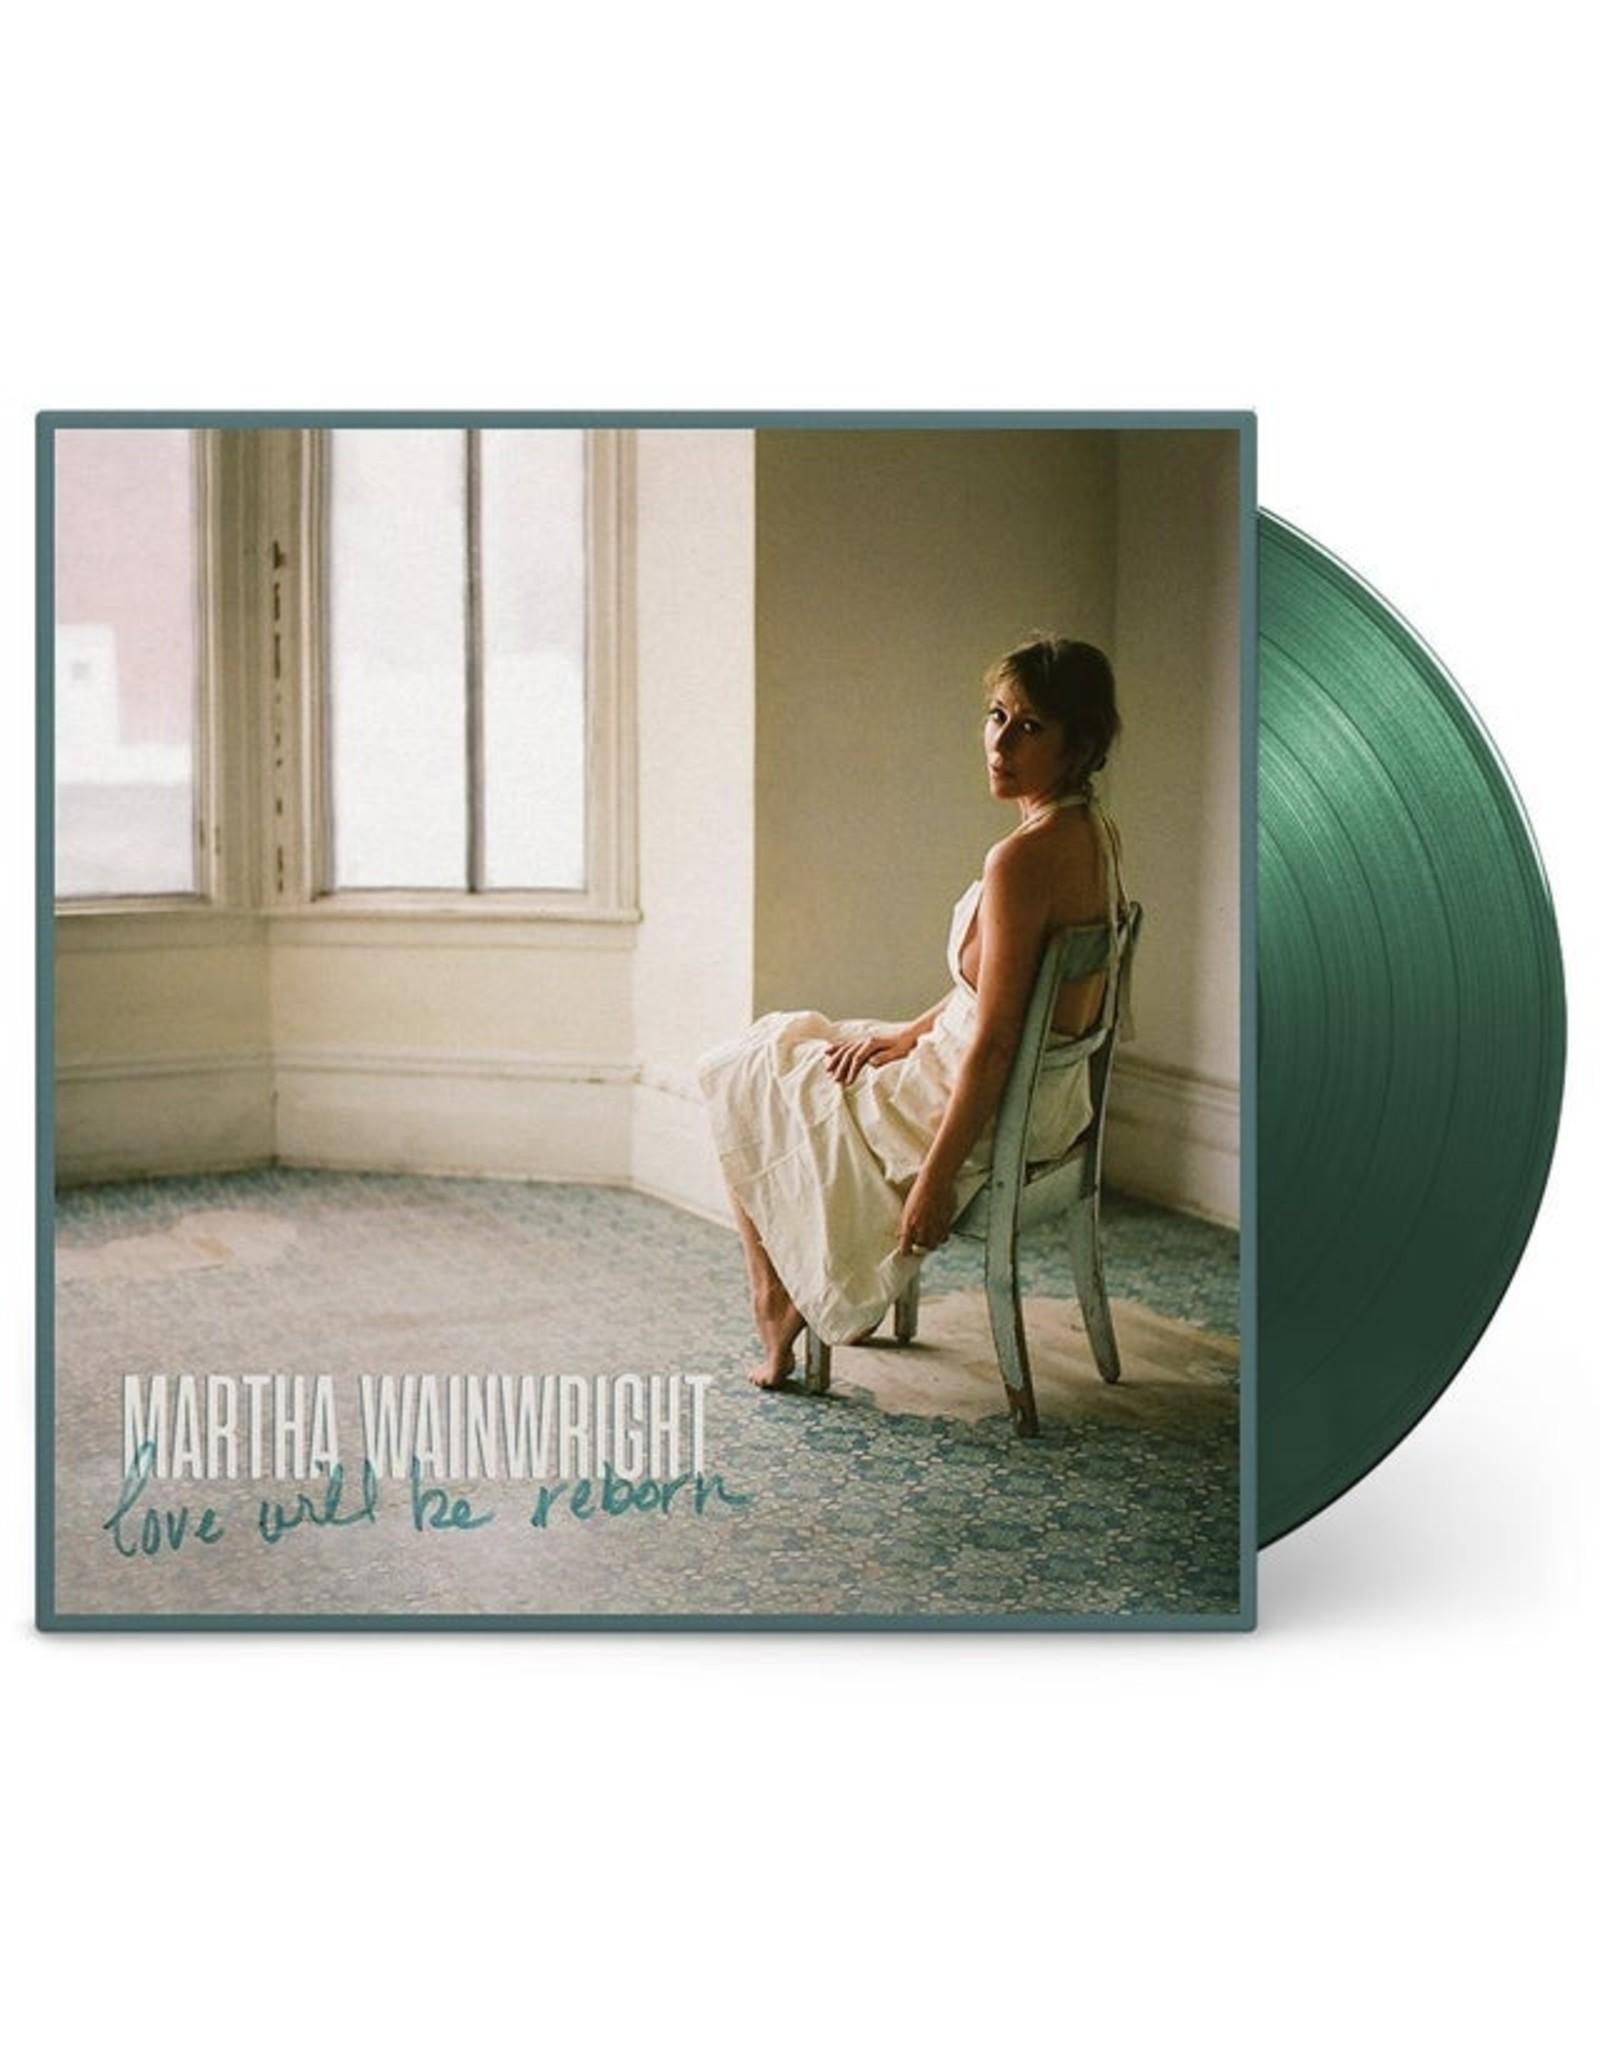 Martha Wainwright - Love Will Be Reborn (Exclusive Green Vinyl)